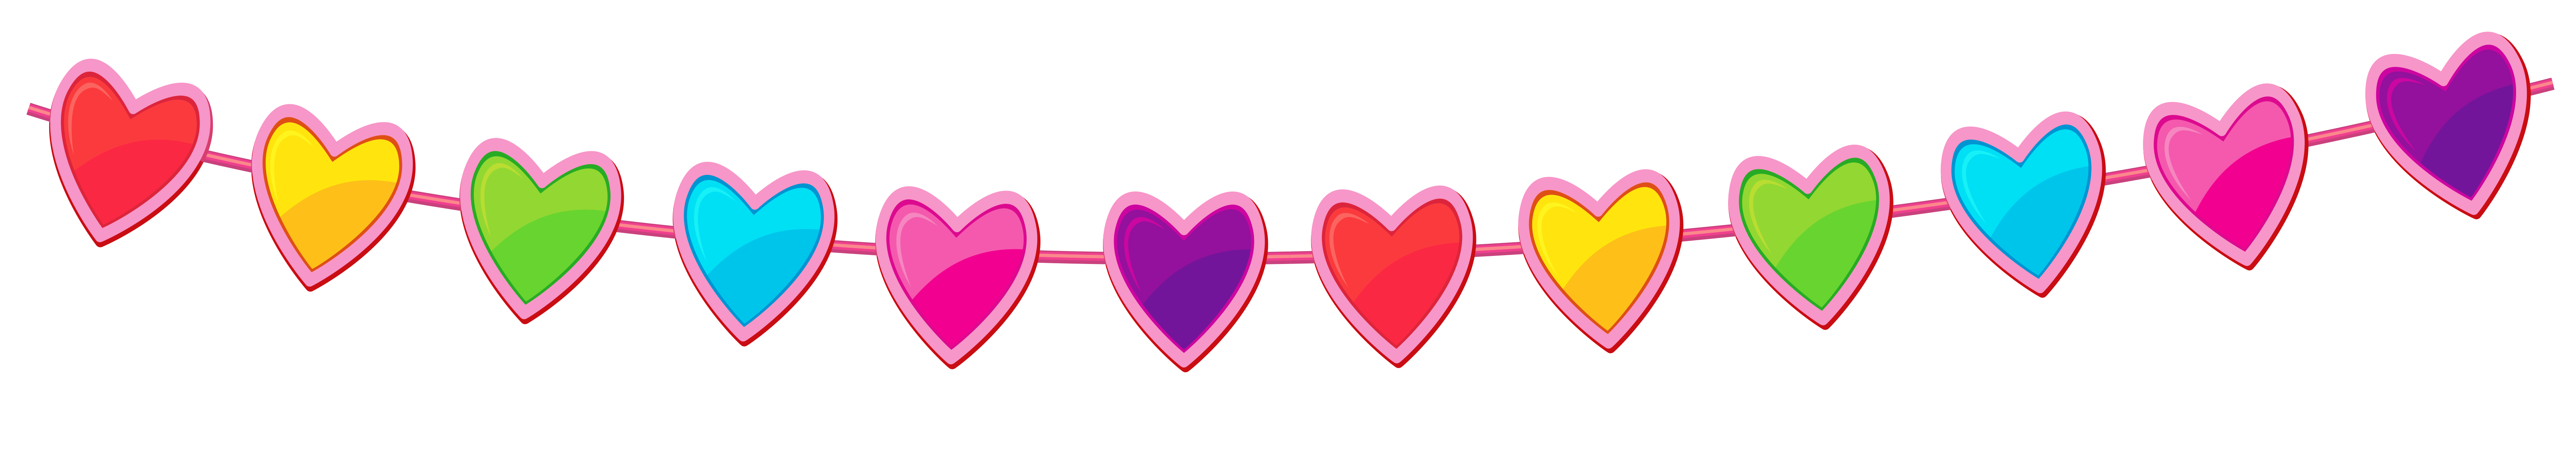 Fun clipart streamer Clipart Heart size PNG Transparent